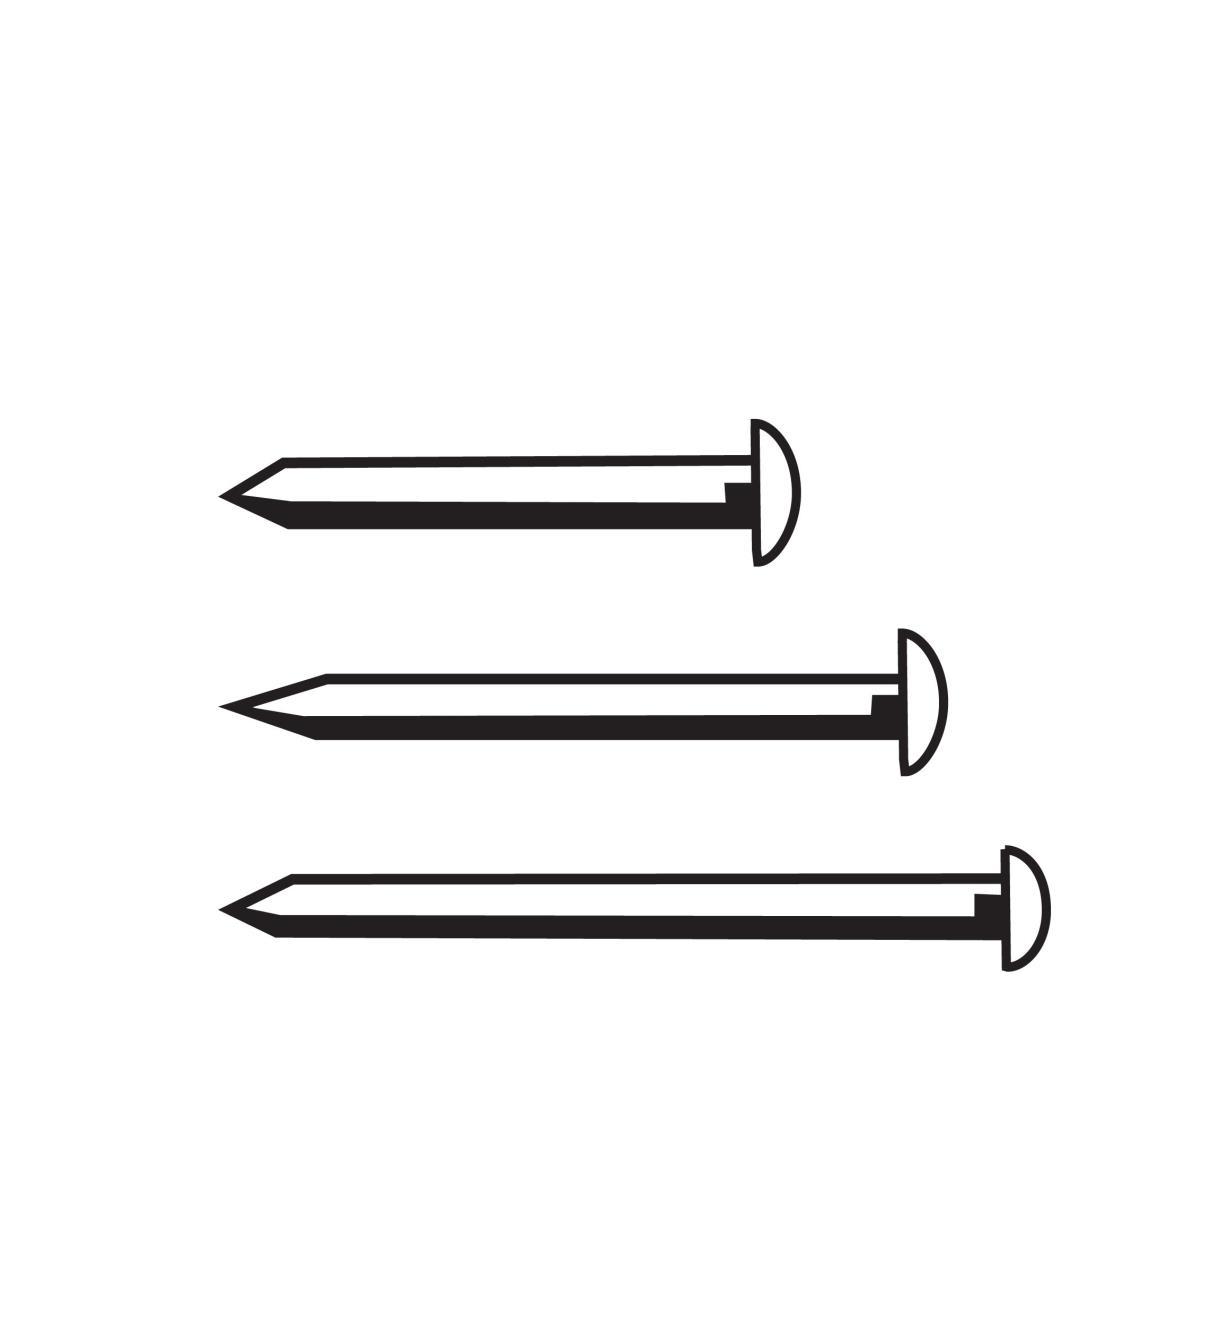 00D4001 - 9mm Esc Pins, RH, 10g